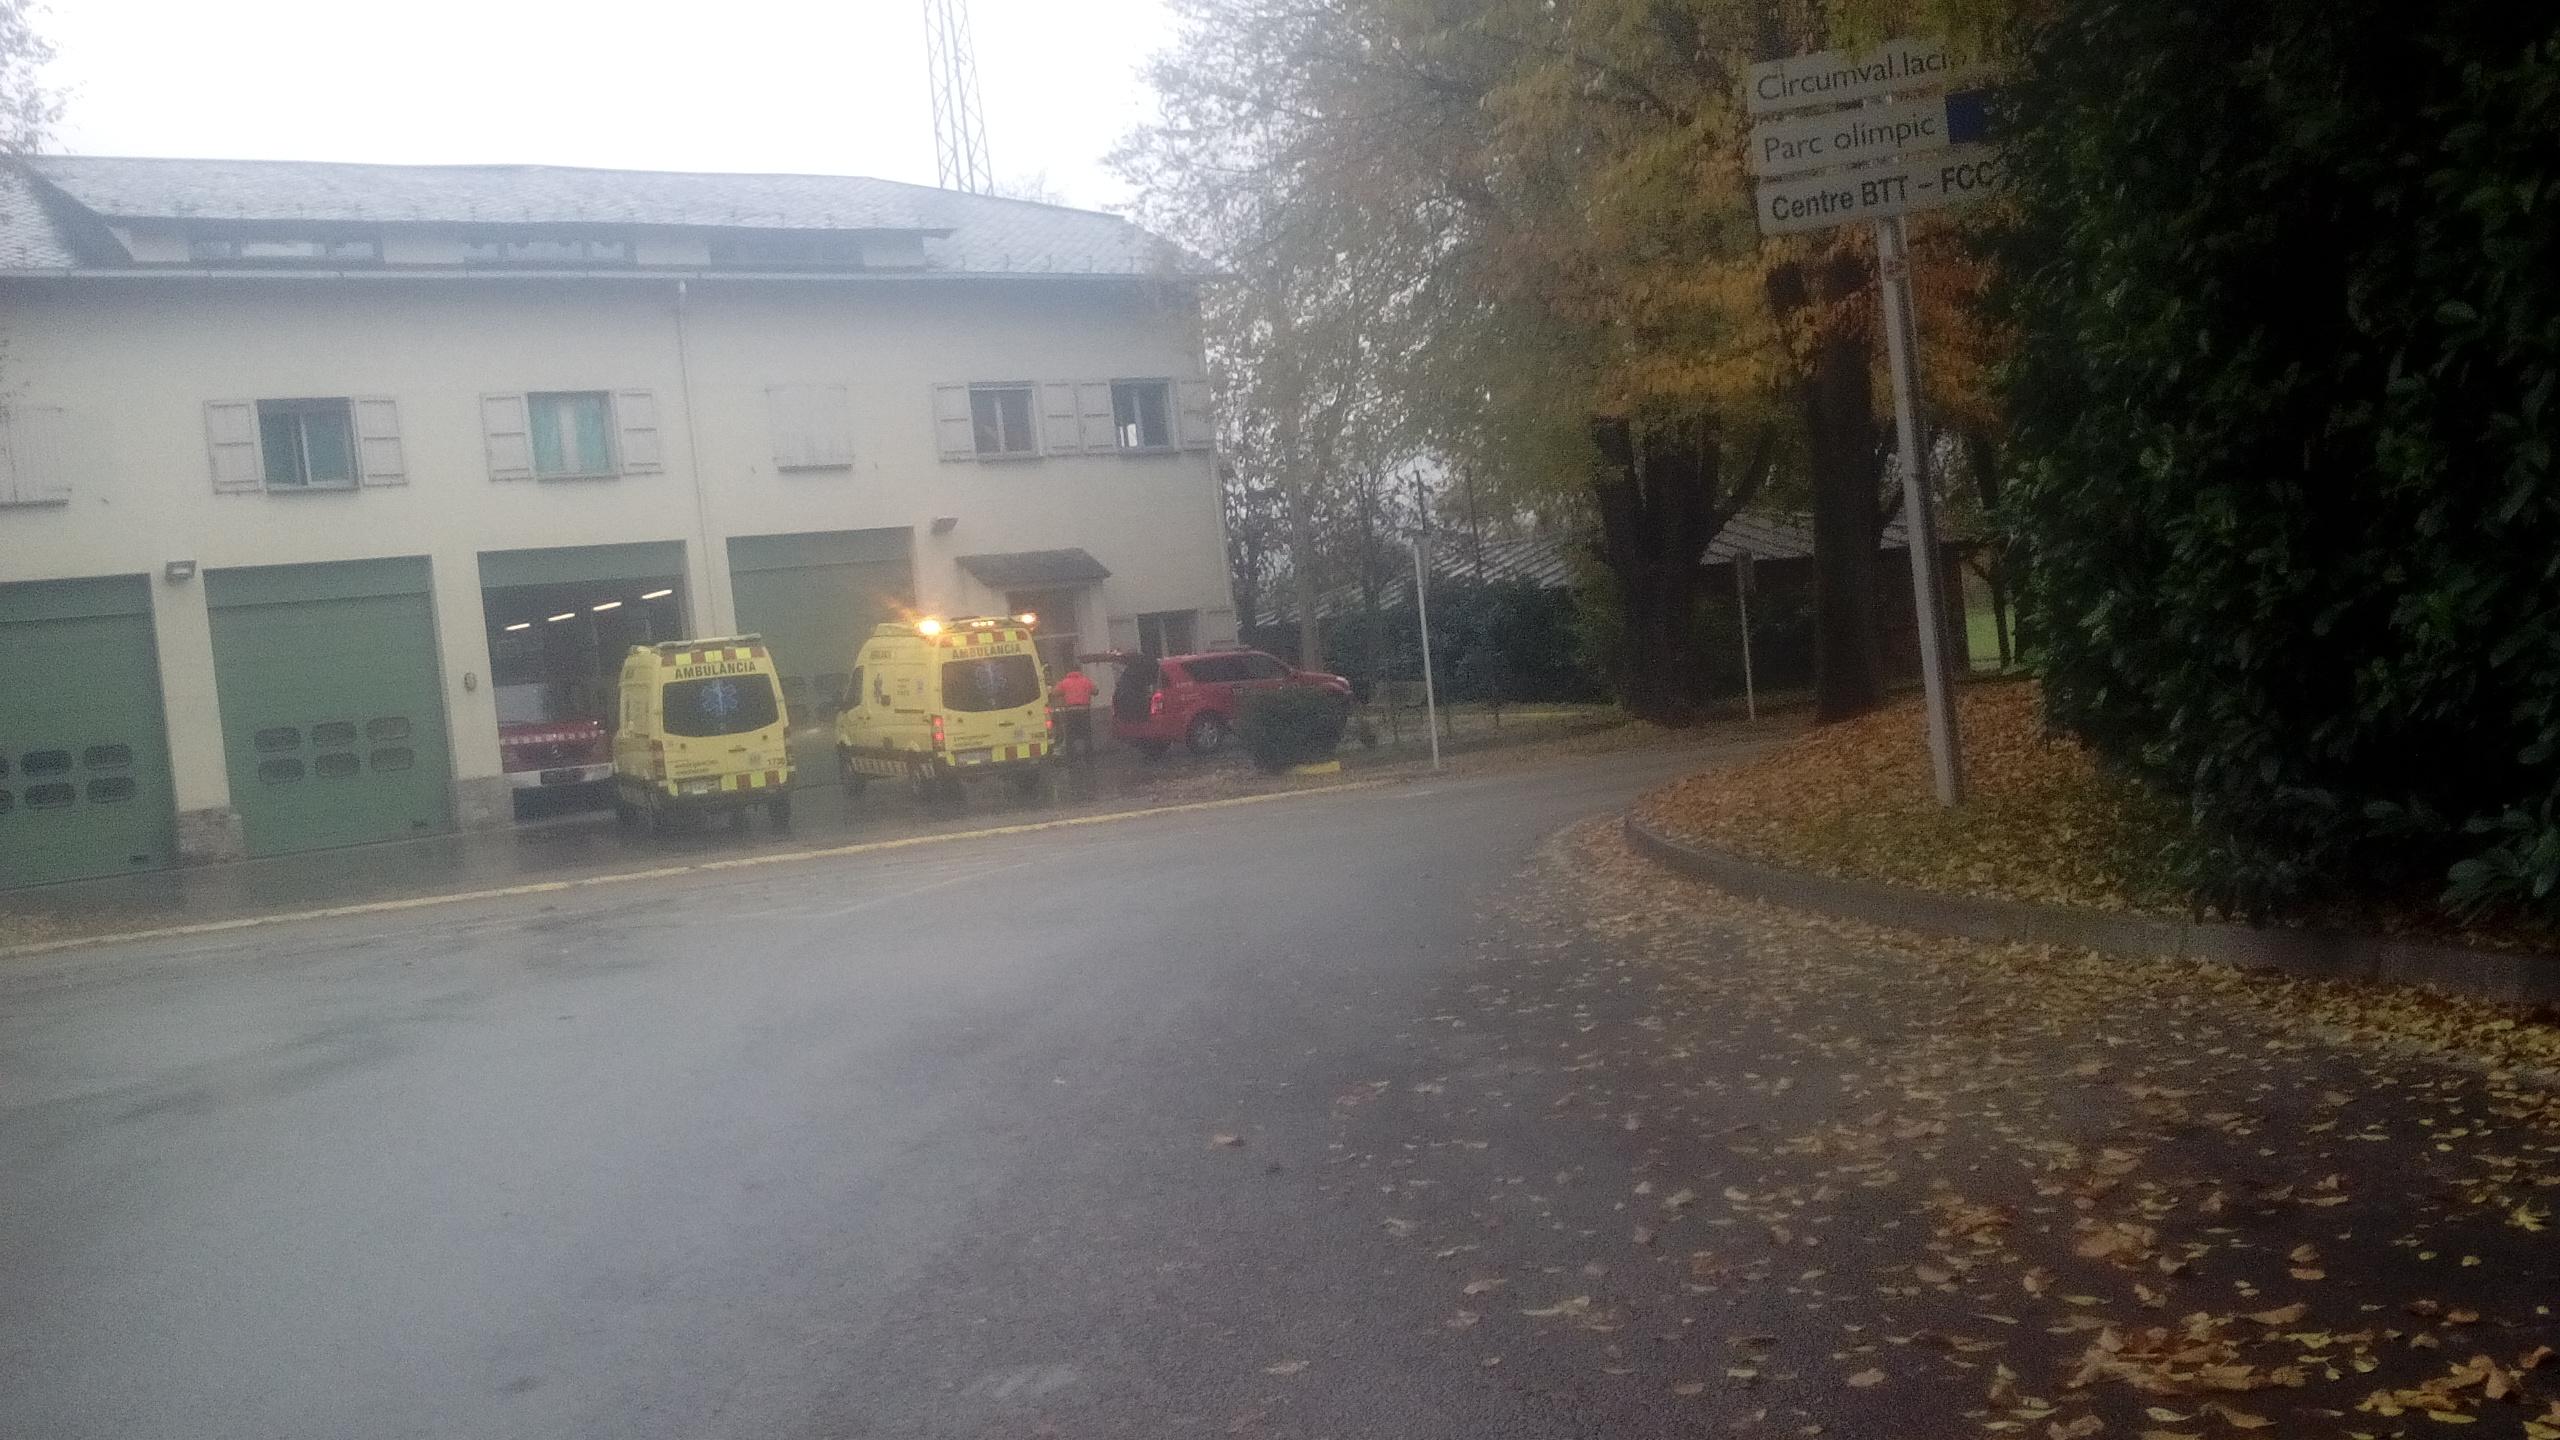 Dues persones ferides, una de gravetat, en un accident laboral a Montant de Tost